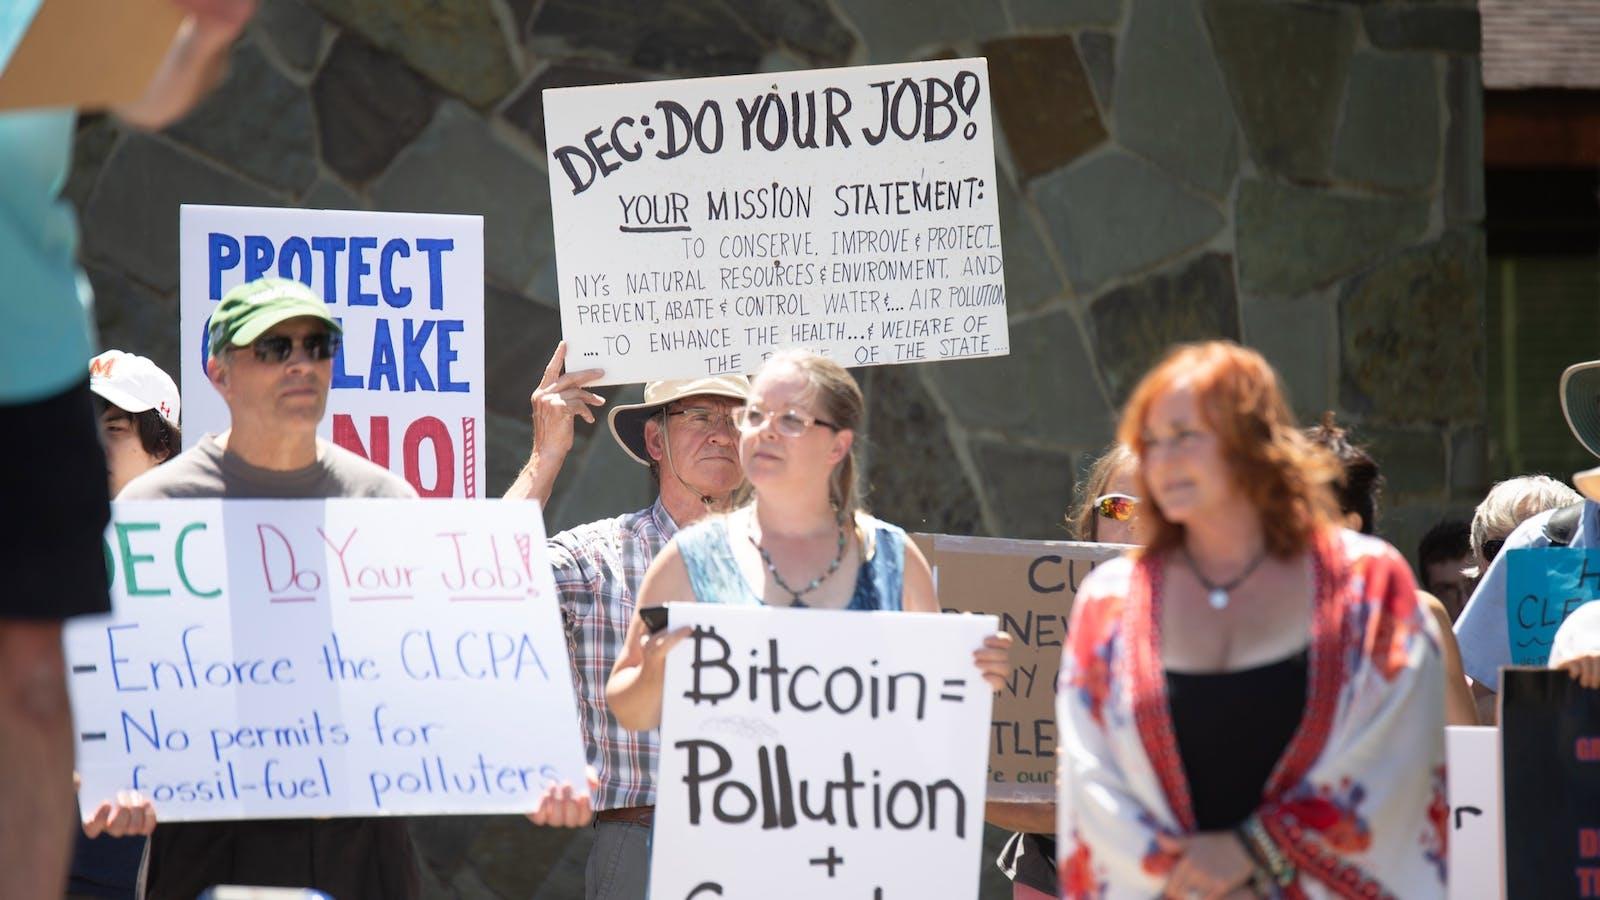 People protested a crypto mining operation near Seneca Lake in upstate New York last month. Photo: Kelly Marciniak—Marciniak Photography